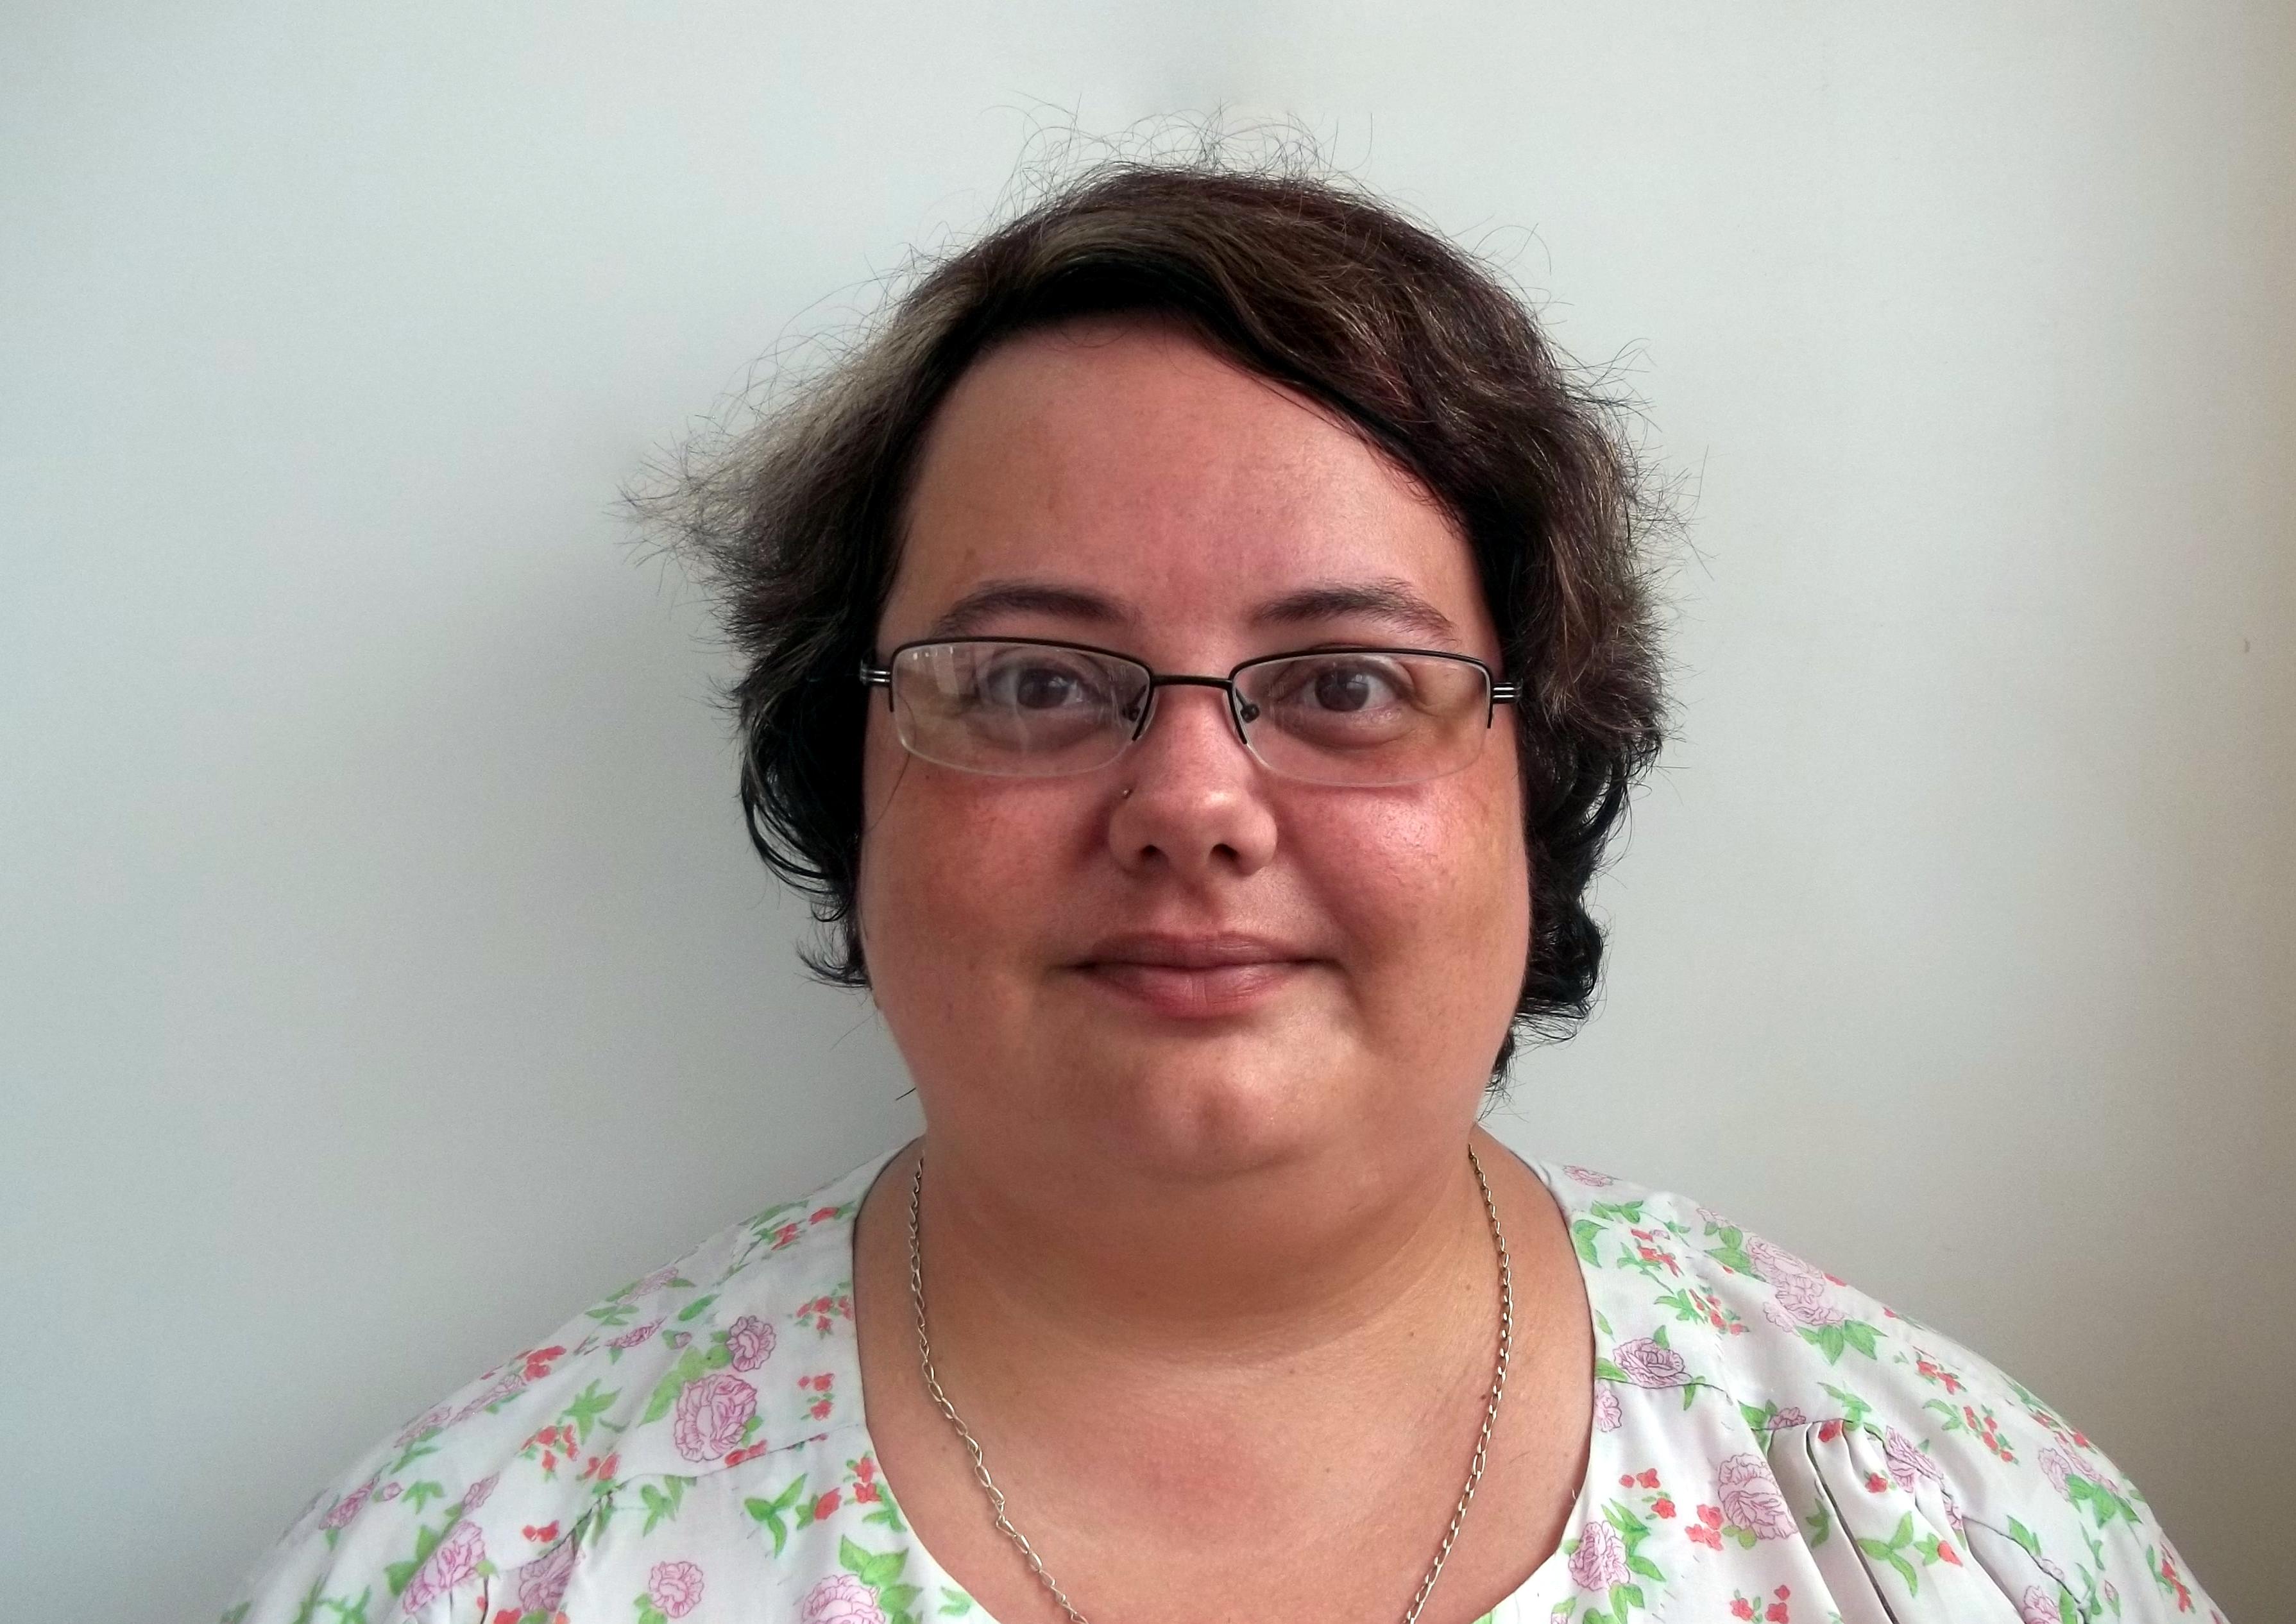 Profiel foto van Hannelie Proefleser